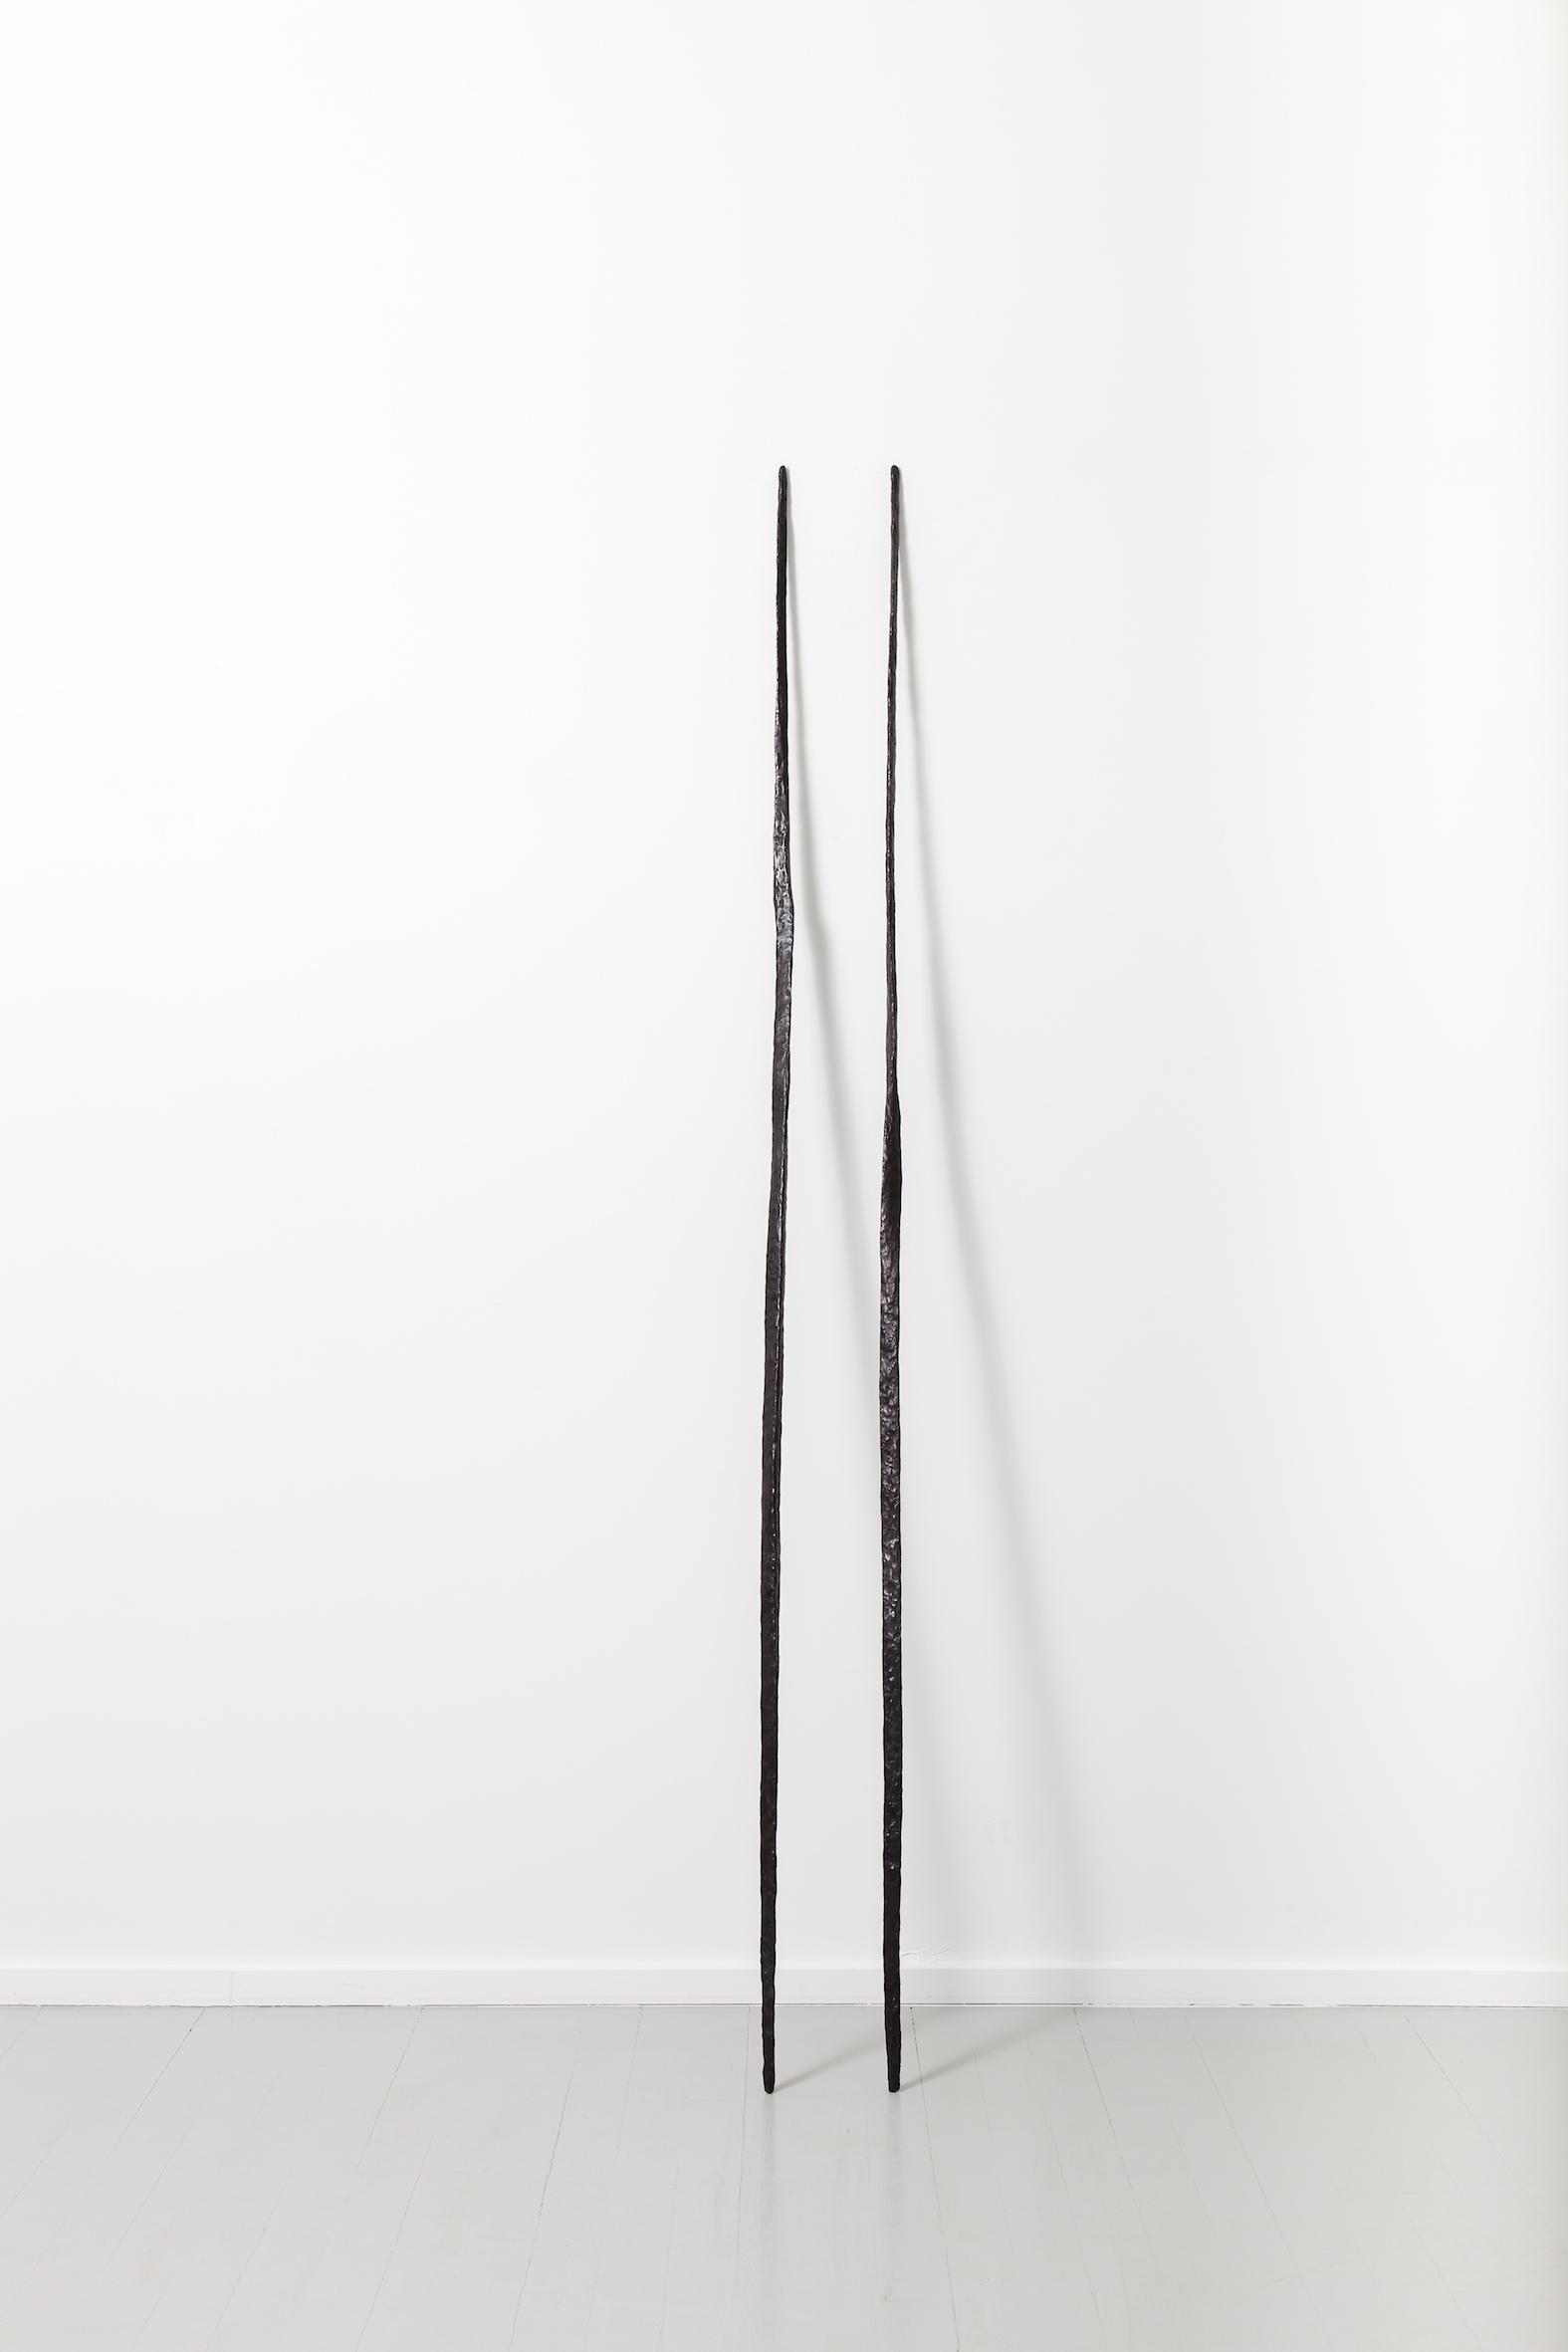 Sculpture II, 2017, patinated bronze in 2 parts, 193,5 x 17w x 32d cm